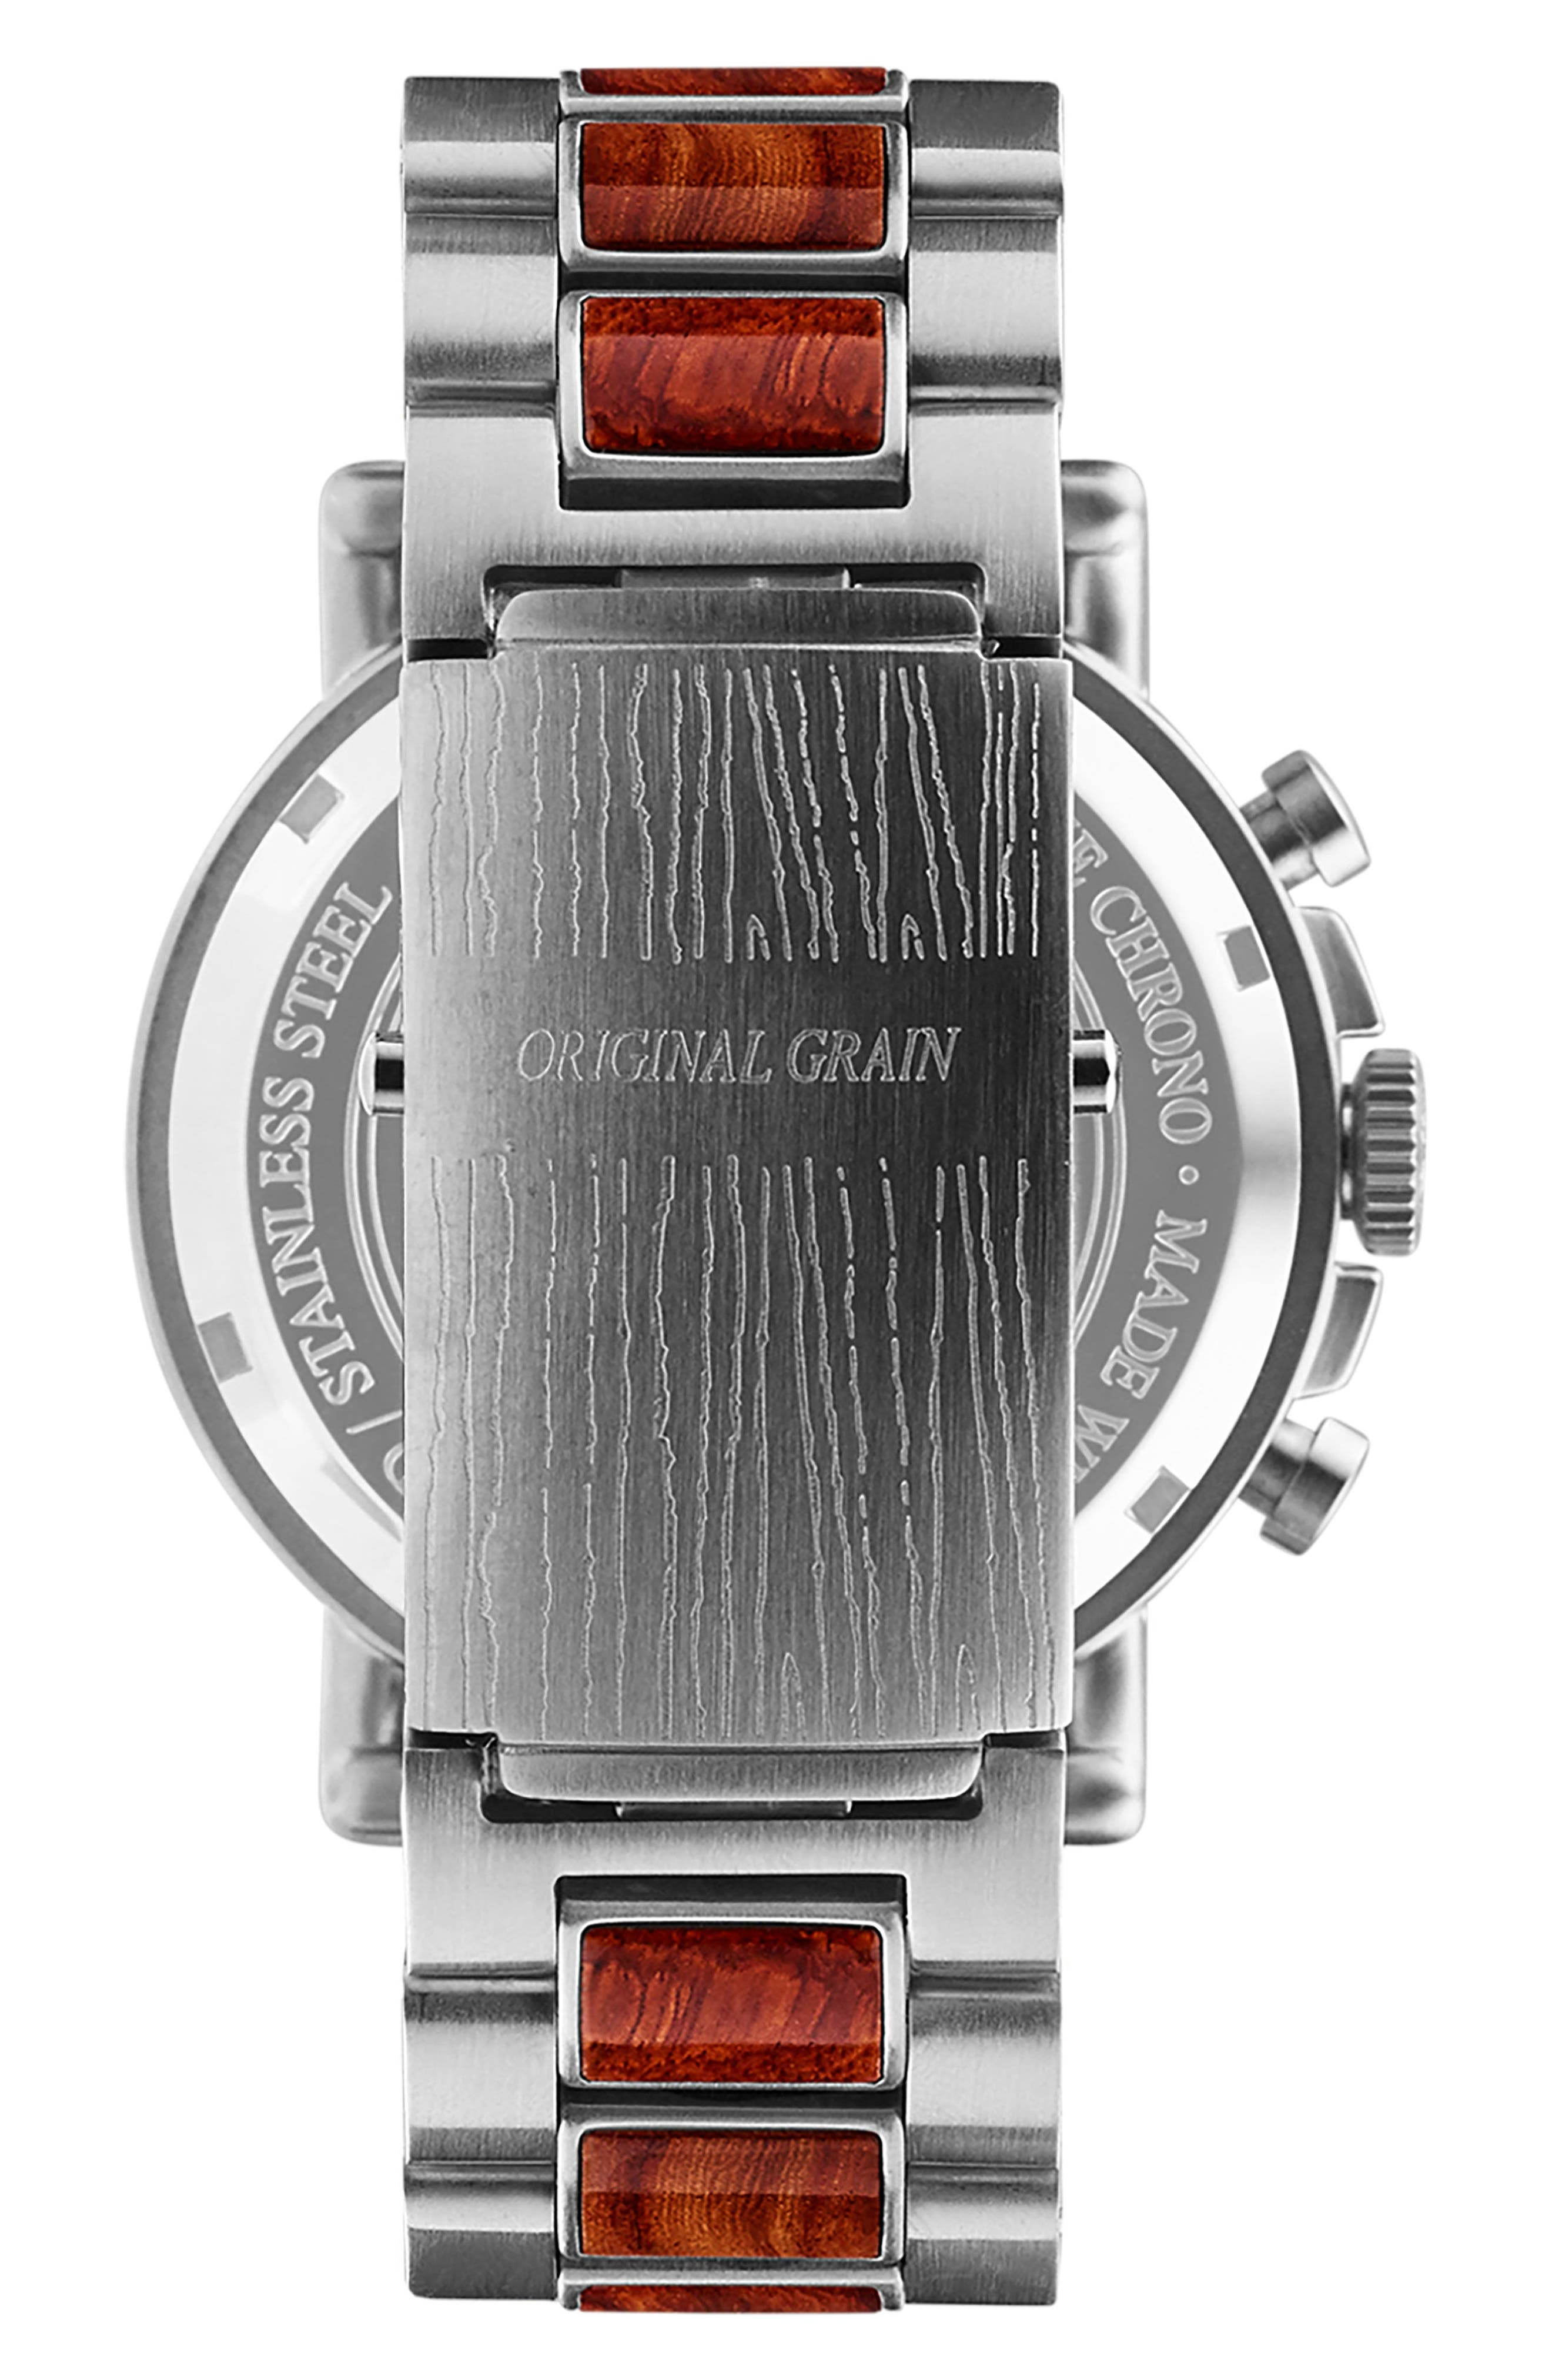 Alternate Image 2  - Original Grain Alterra Chronograph Bracelet Watch